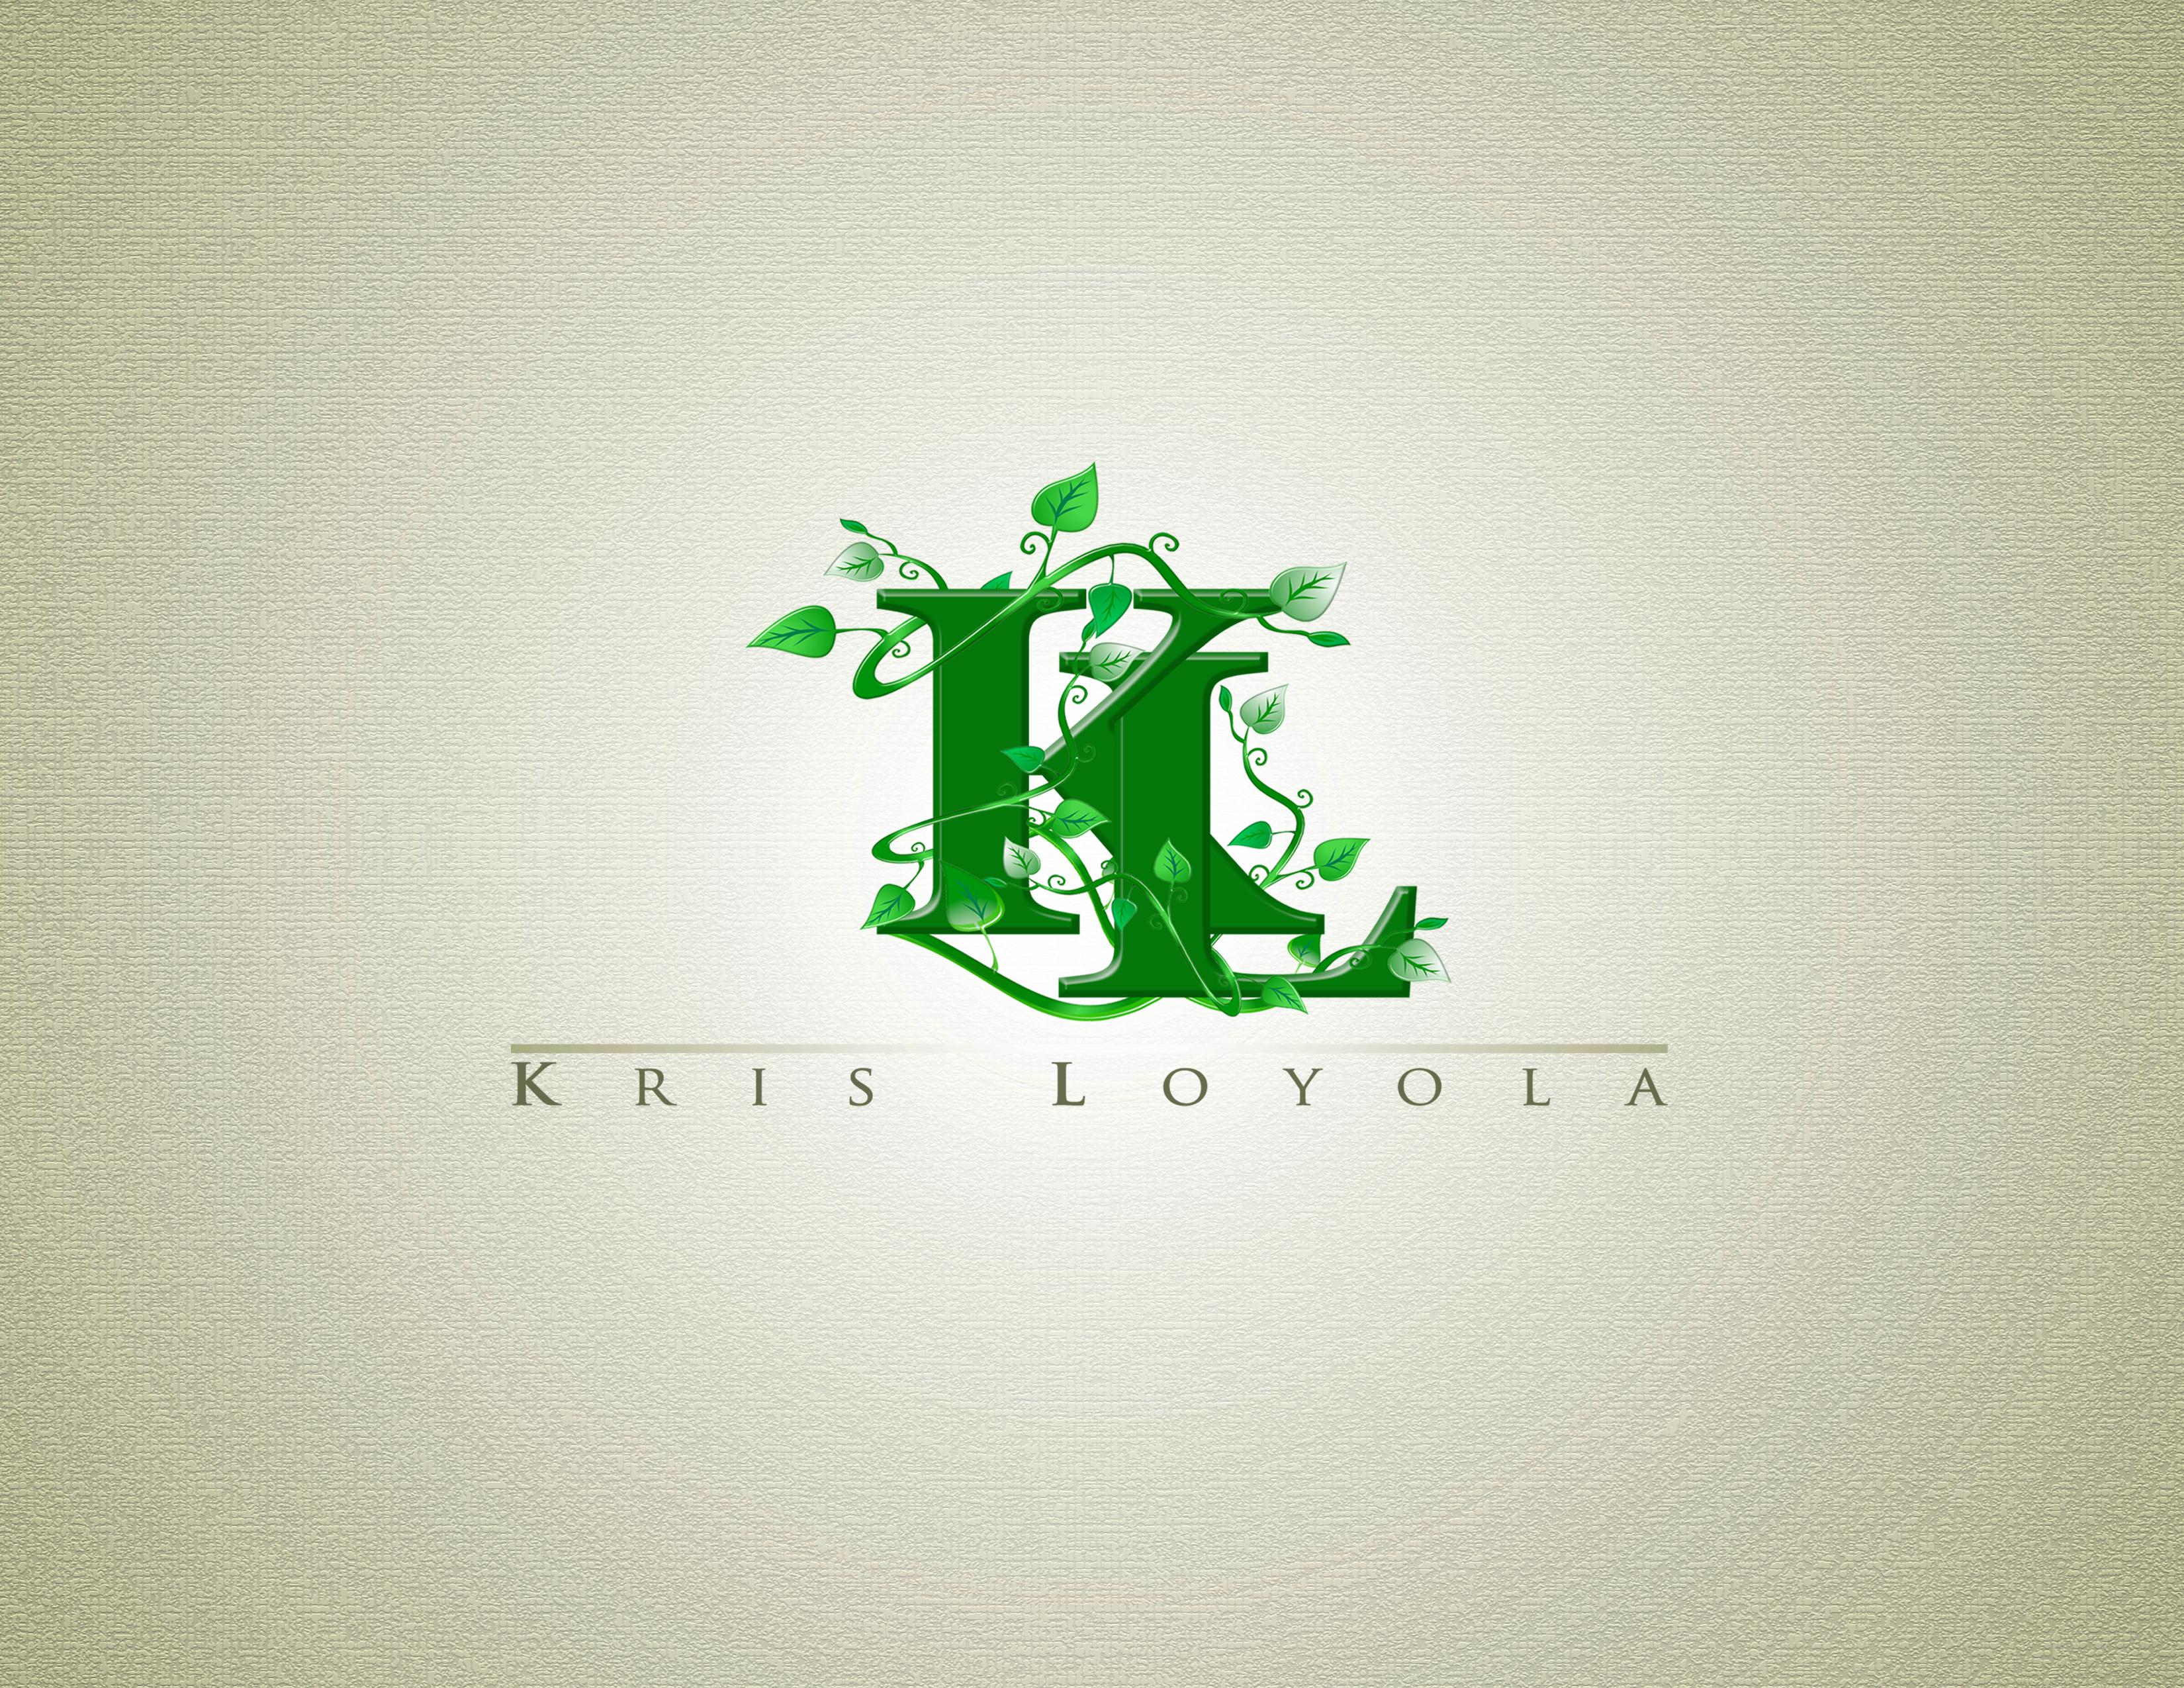 Logo Design by Private User - Entry No. 24 in the Logo Design Contest Kris Loyola Logo Design.